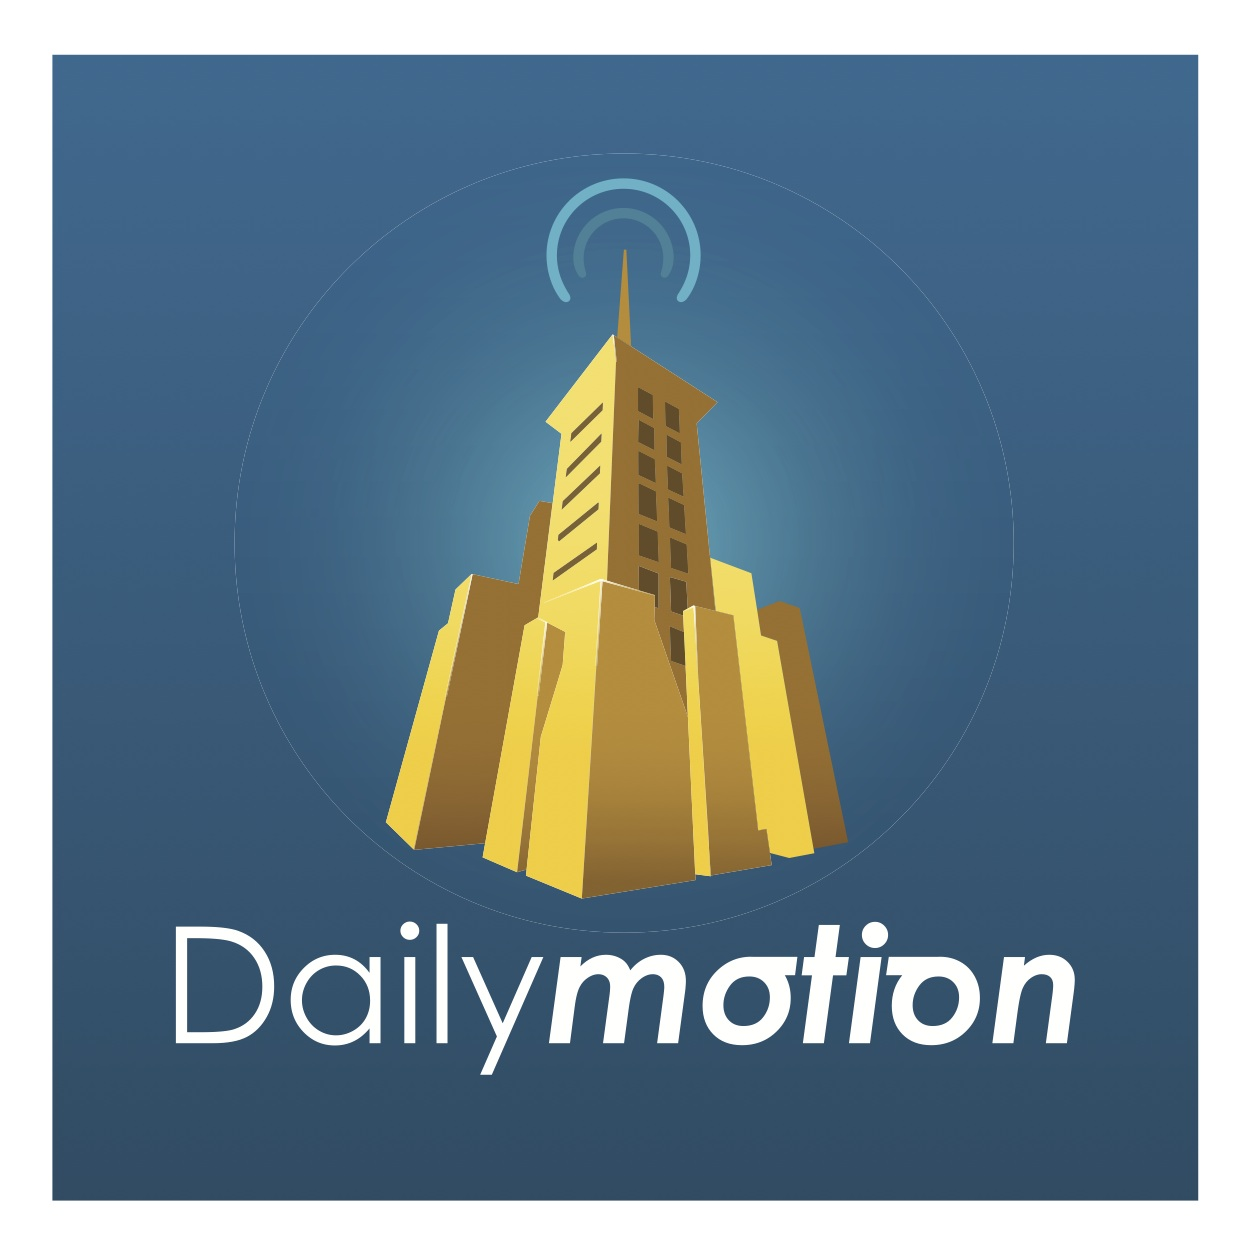 Dalymotion